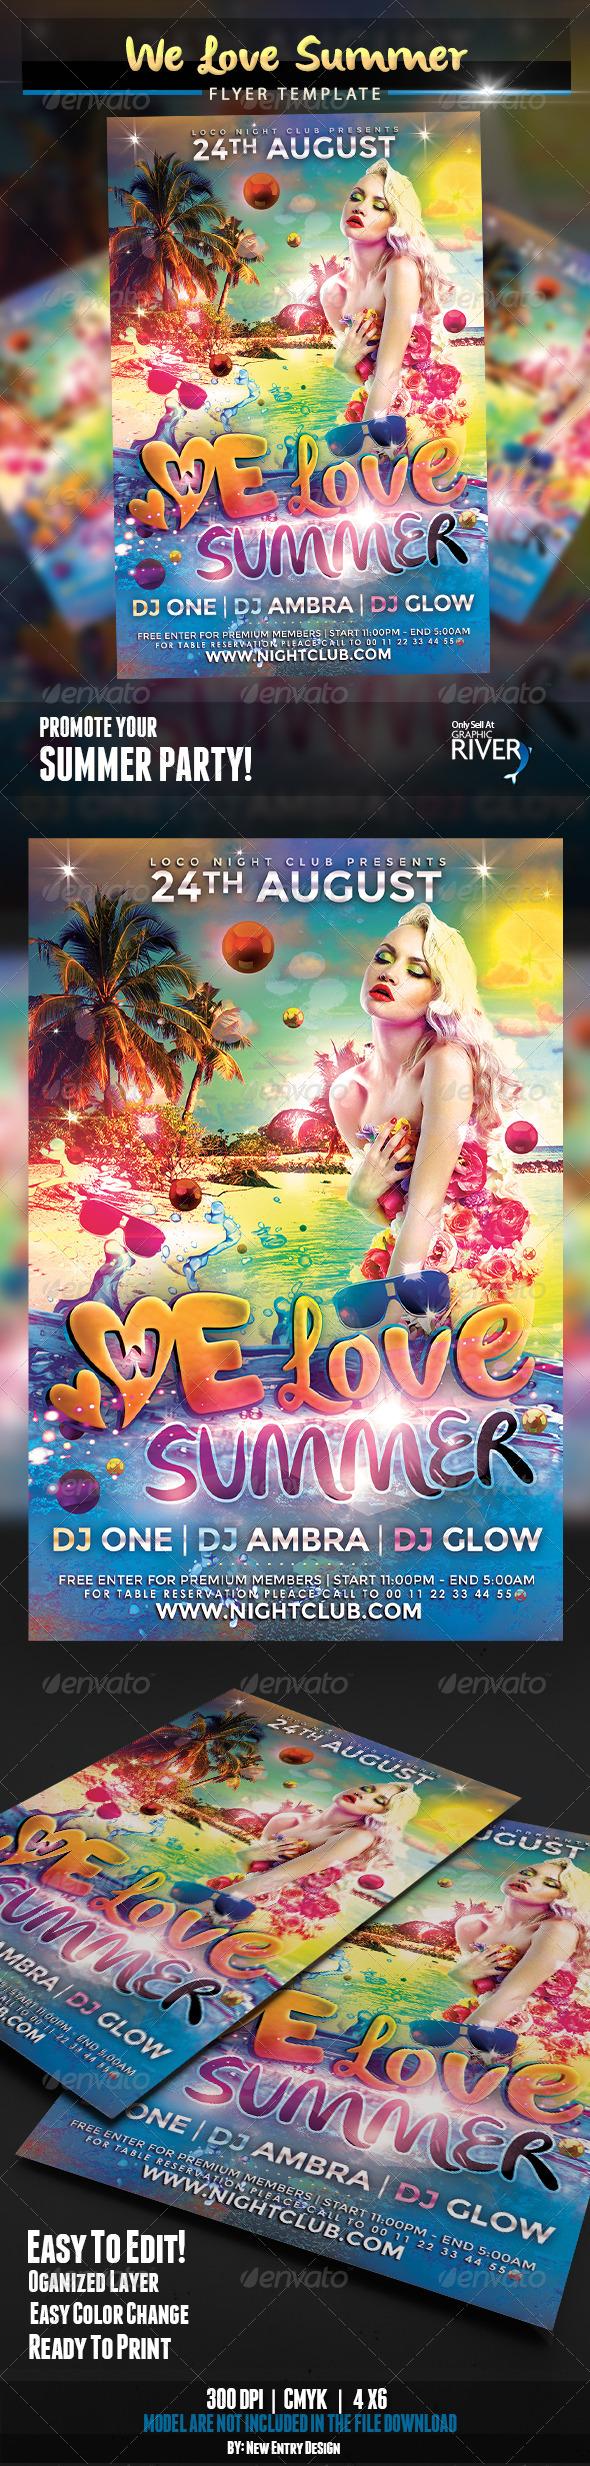 We Love Summer Flyer Template